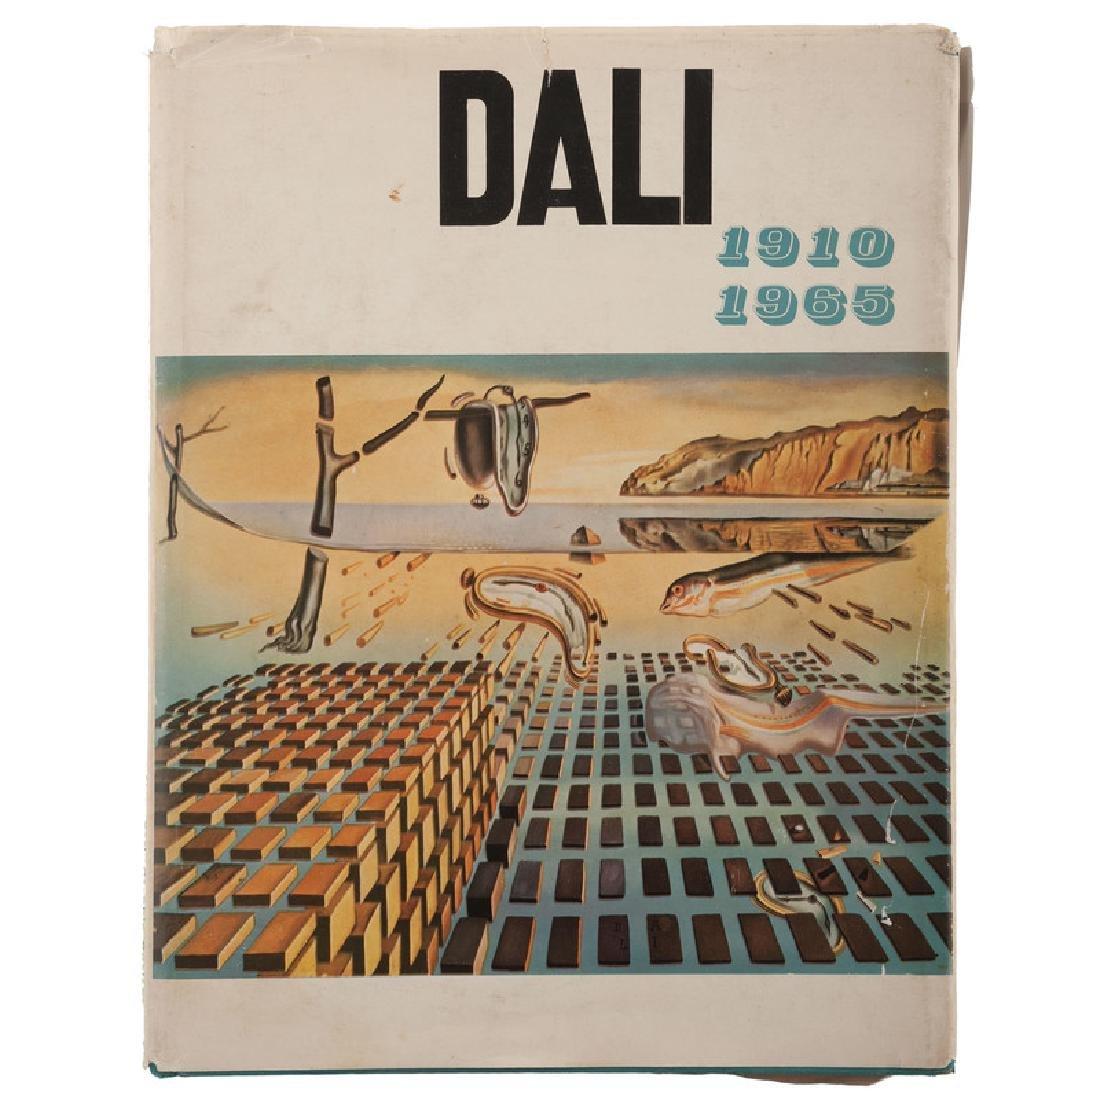 Dali, 1910-1965, Salvador Dali Autographed Book